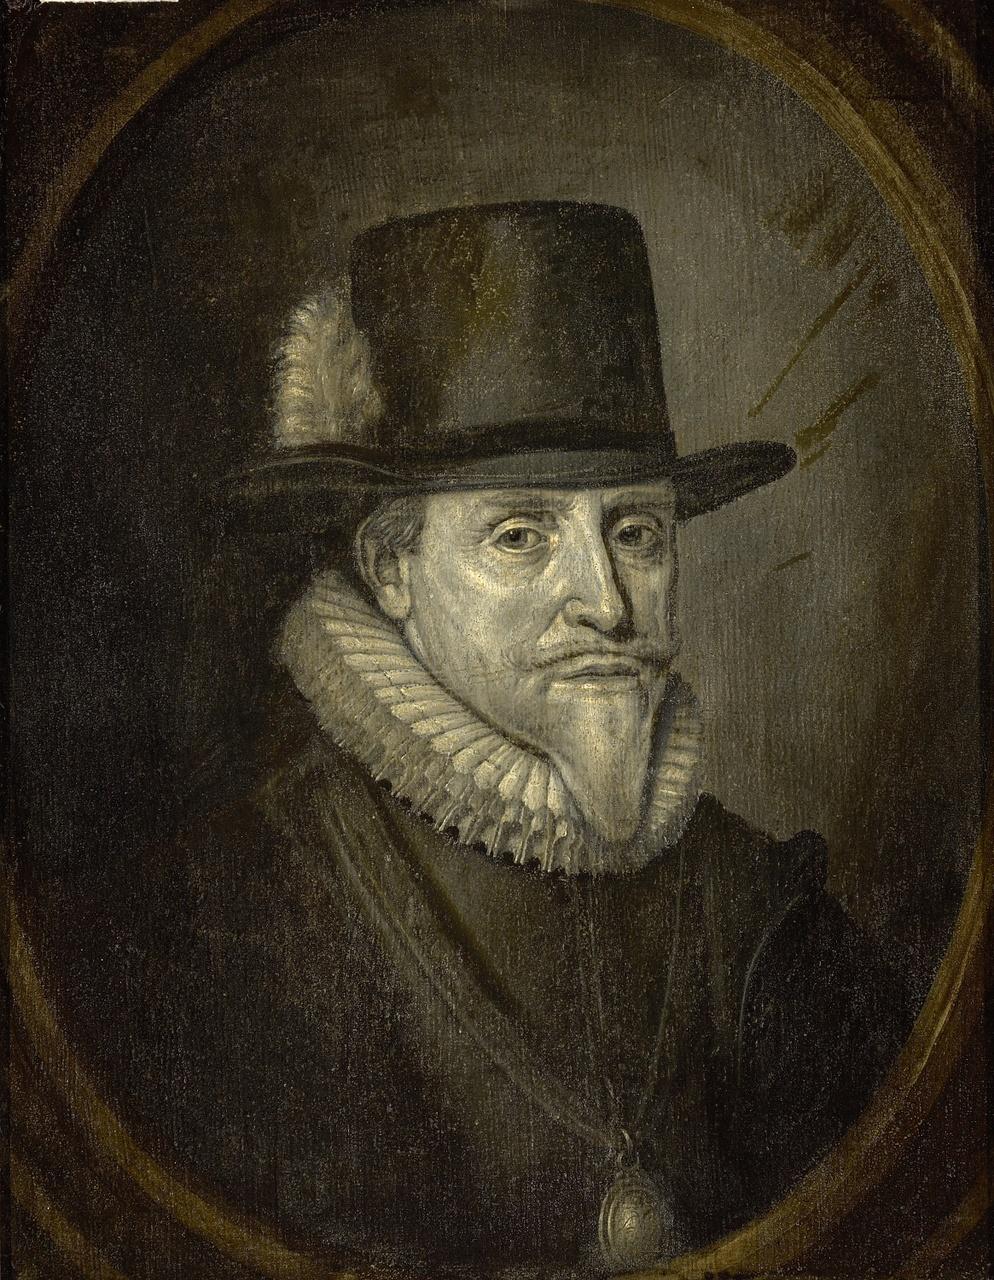 Prins Maurits, Adriaen van de Venne